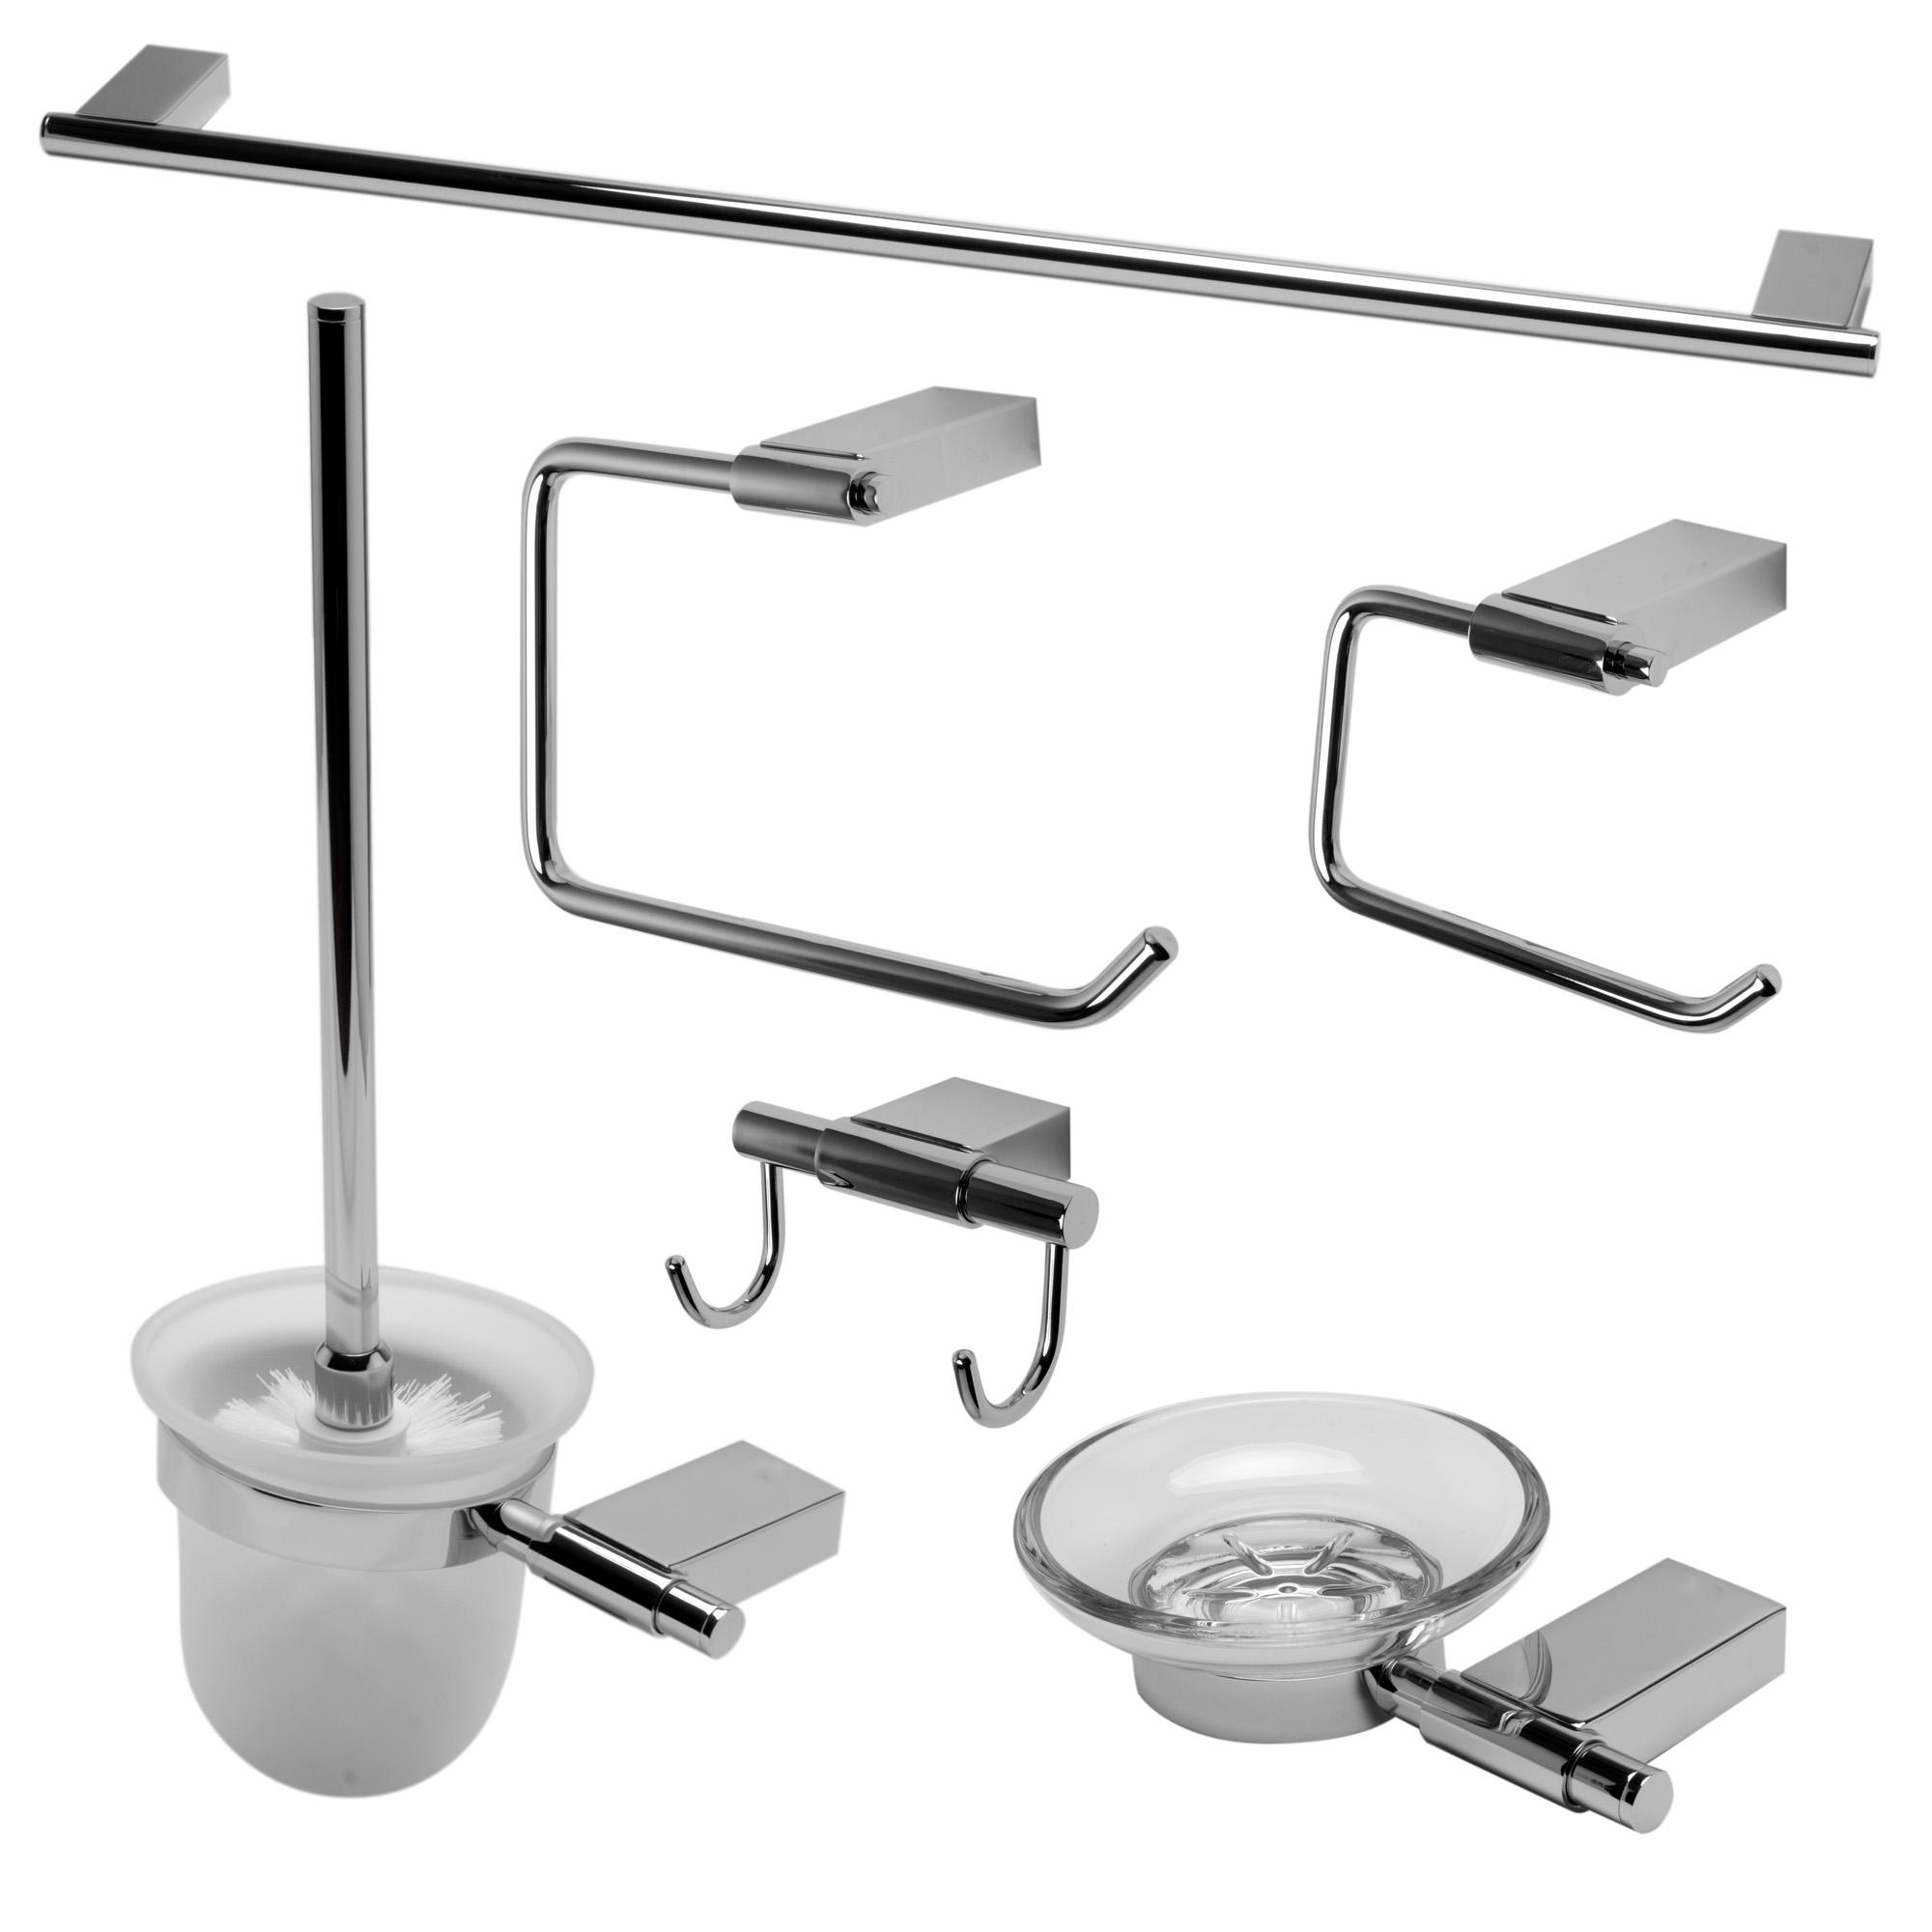 ALFI Brand AB9515-PC Polished Chrome Matching Bathroom Accessory Set, 6 Piece